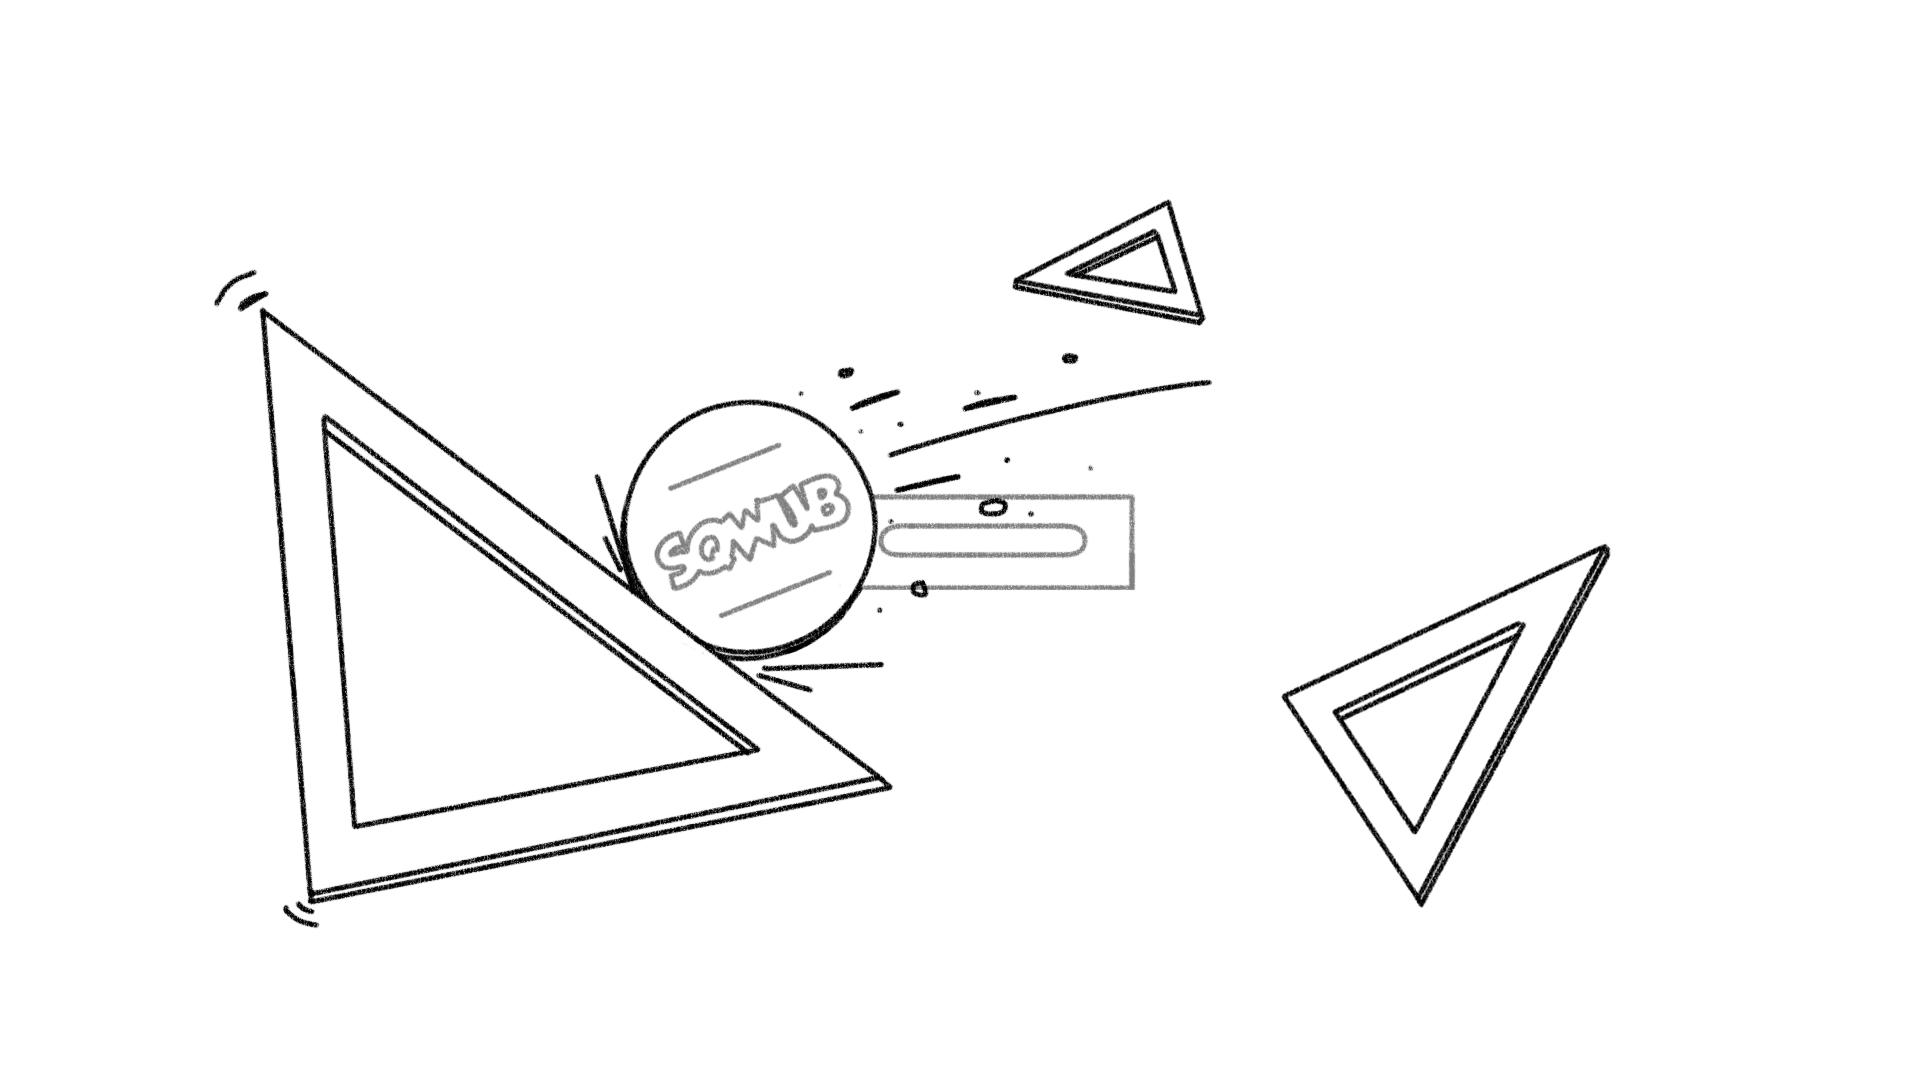 SQWUB-Storyboard-4.png